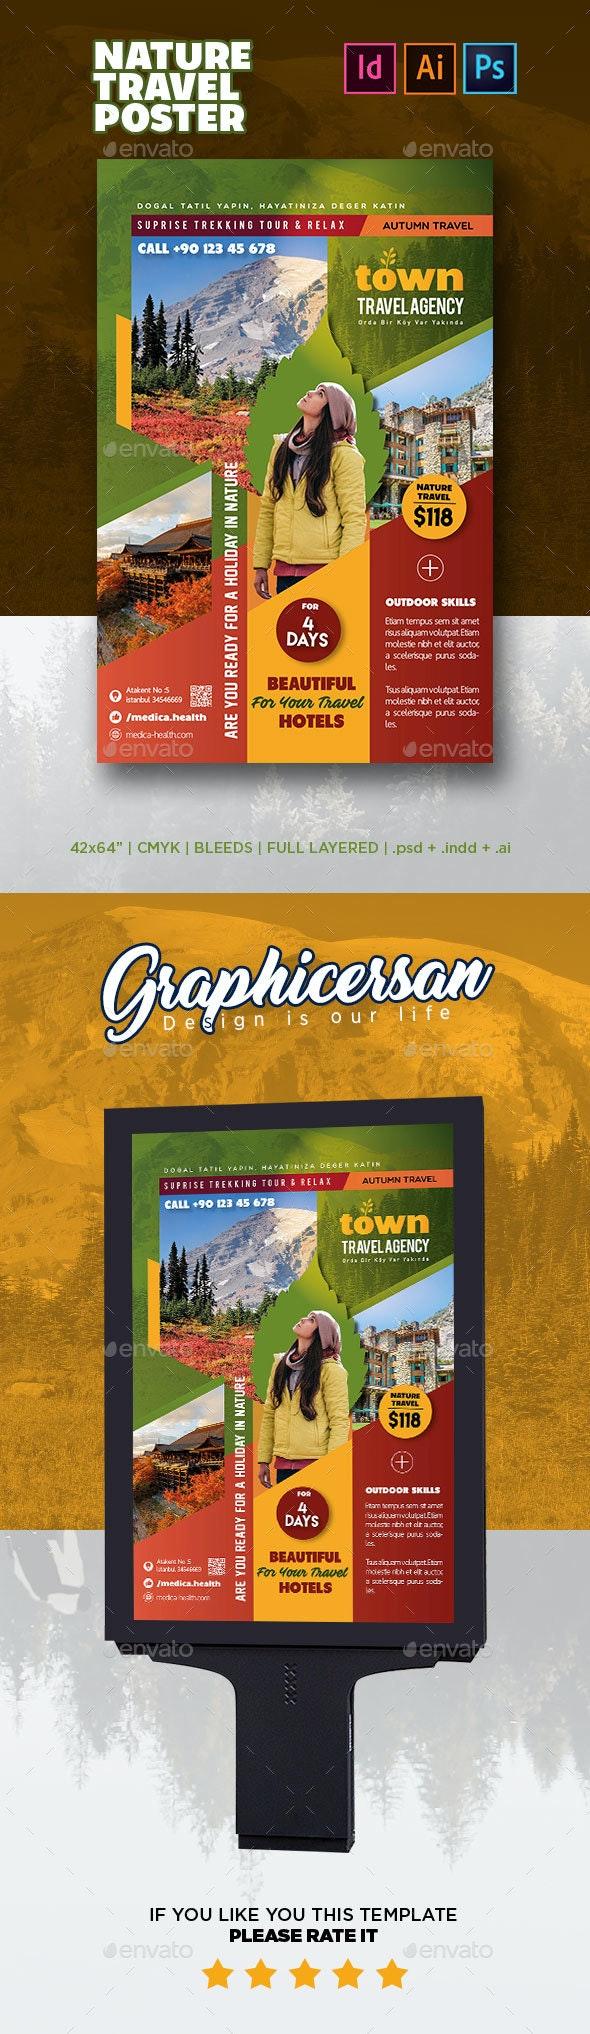 Nature Travel Poster - Signage Print Templates